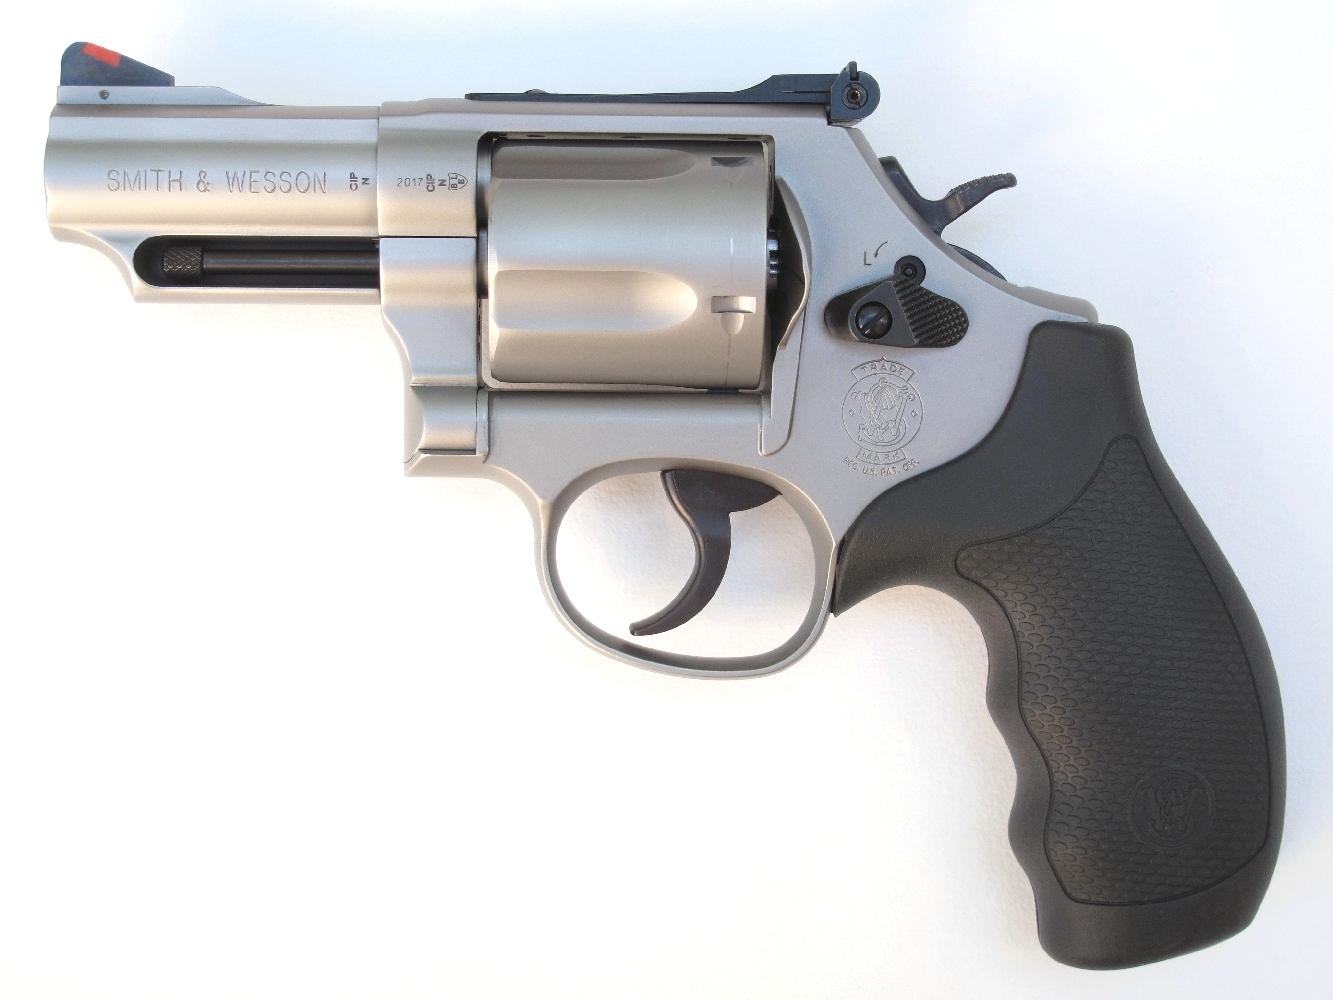 Revolver S&W modèle 69 « Combat Magnum » en calibre .44 Magnum